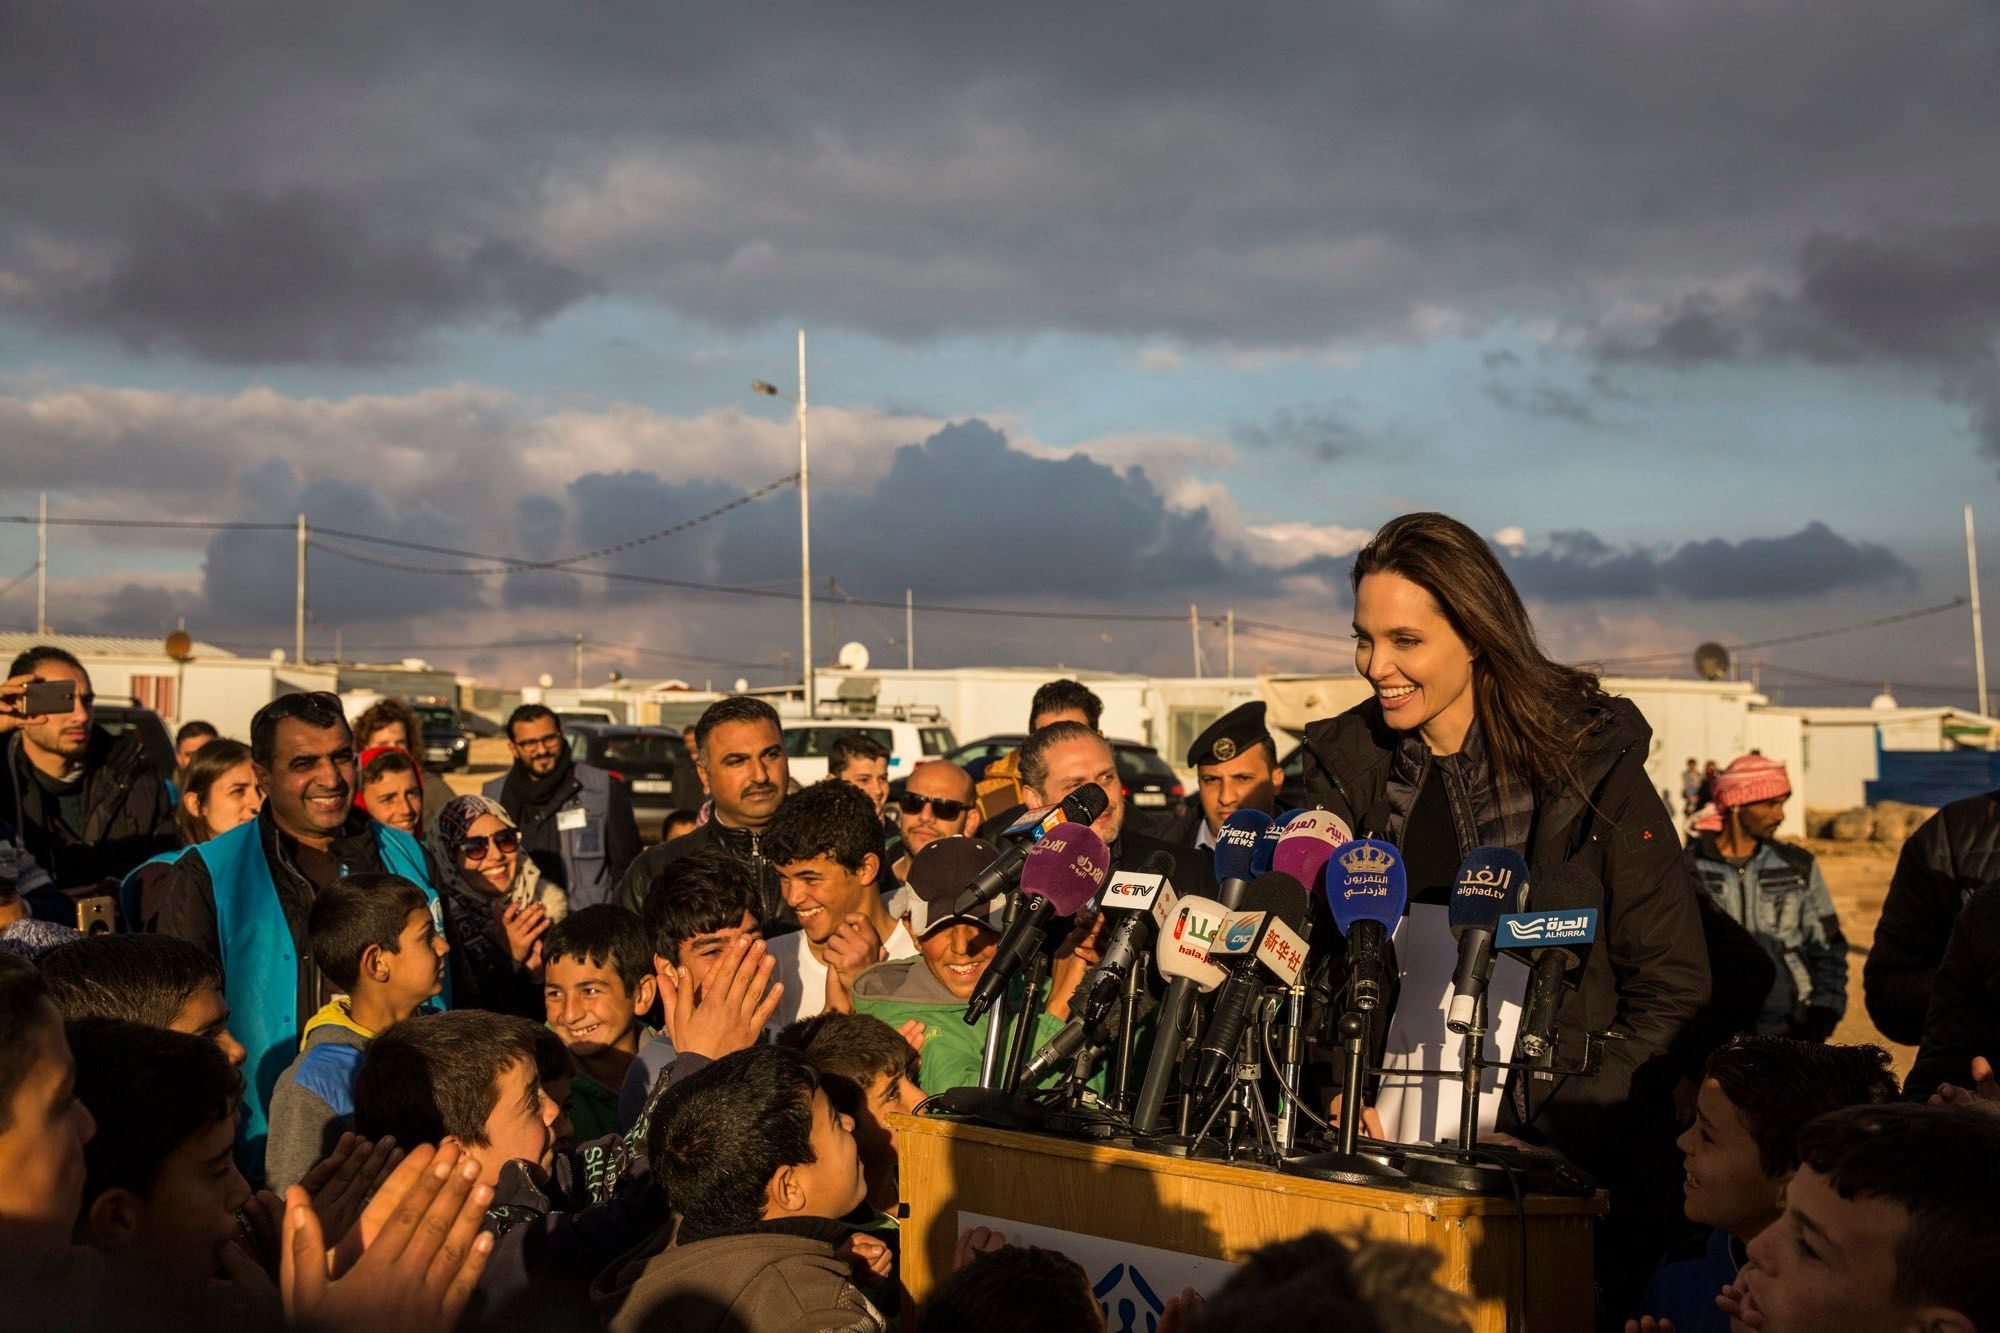 Syrian refugees in the Za'atari camp in Jordan 2018, © UNHCR/Ivor Prickett